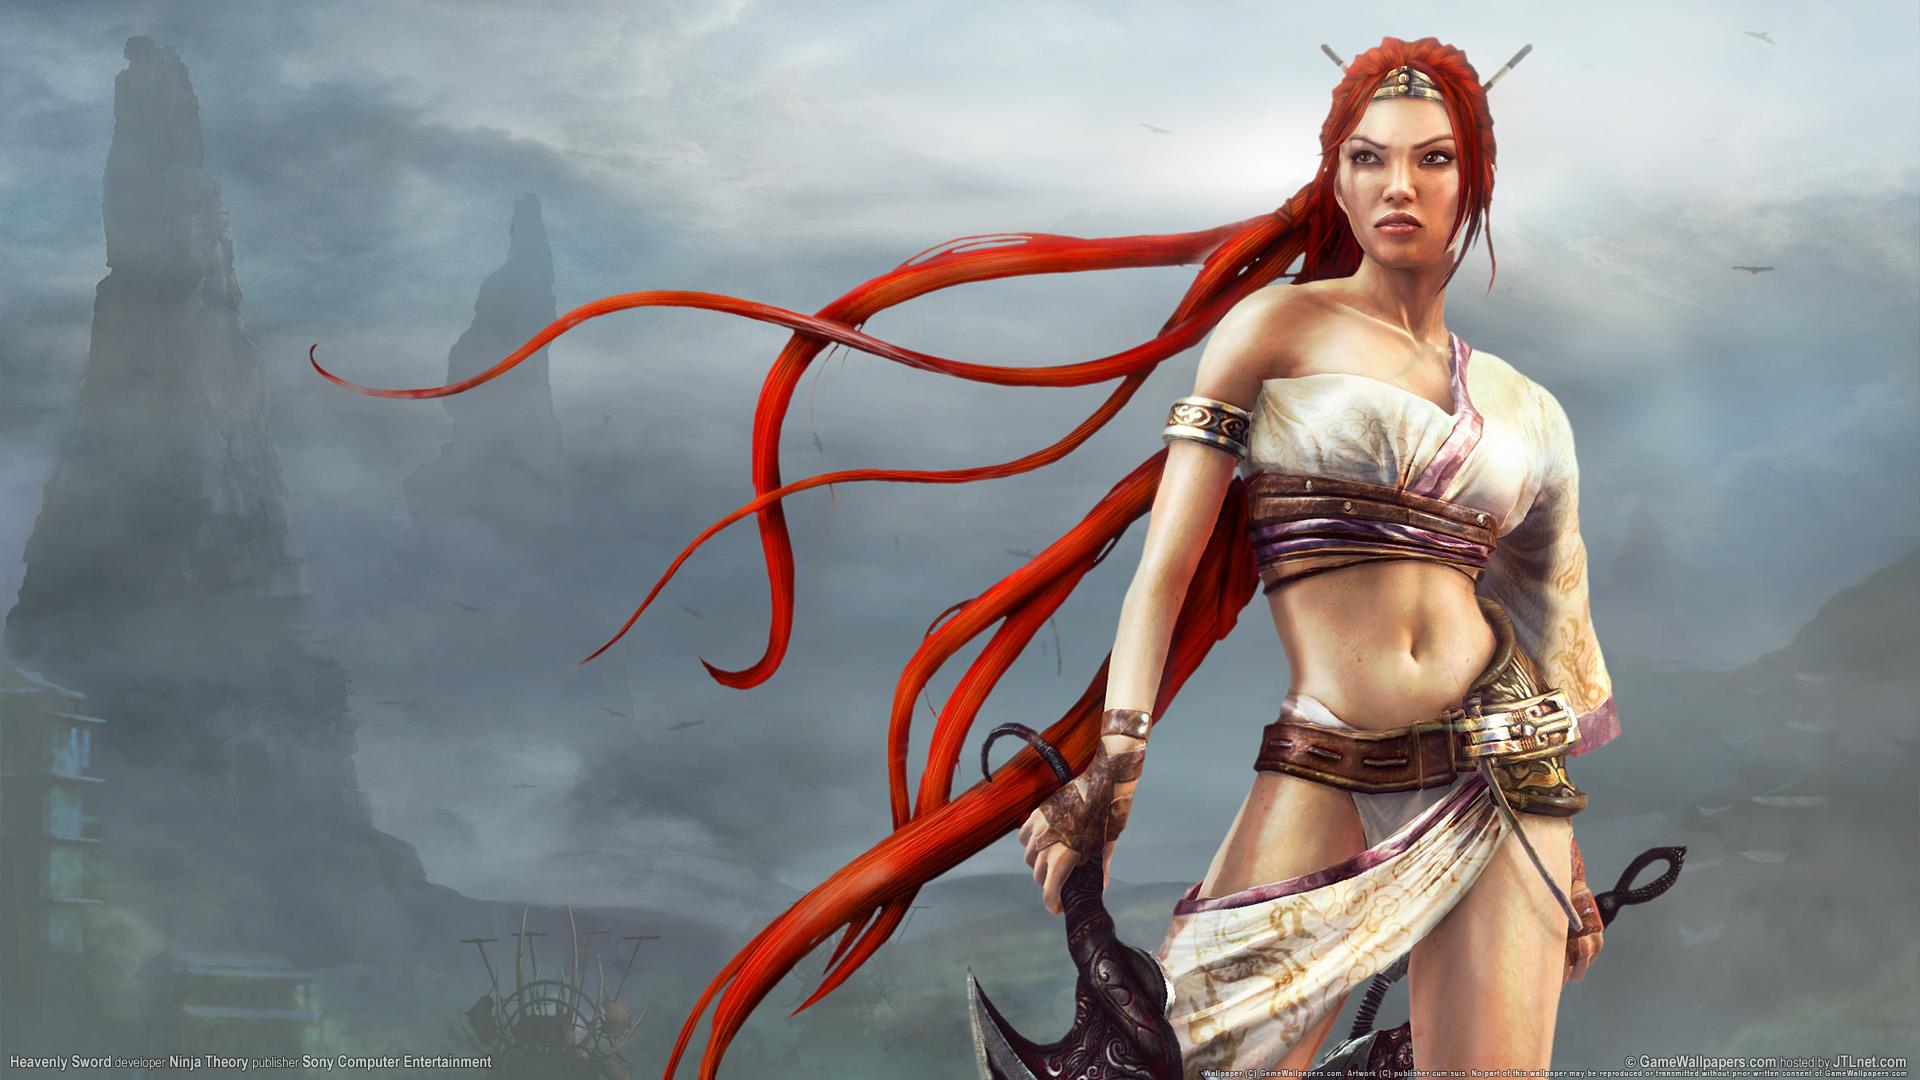 HD Wallpapers Heavenly Sword Game